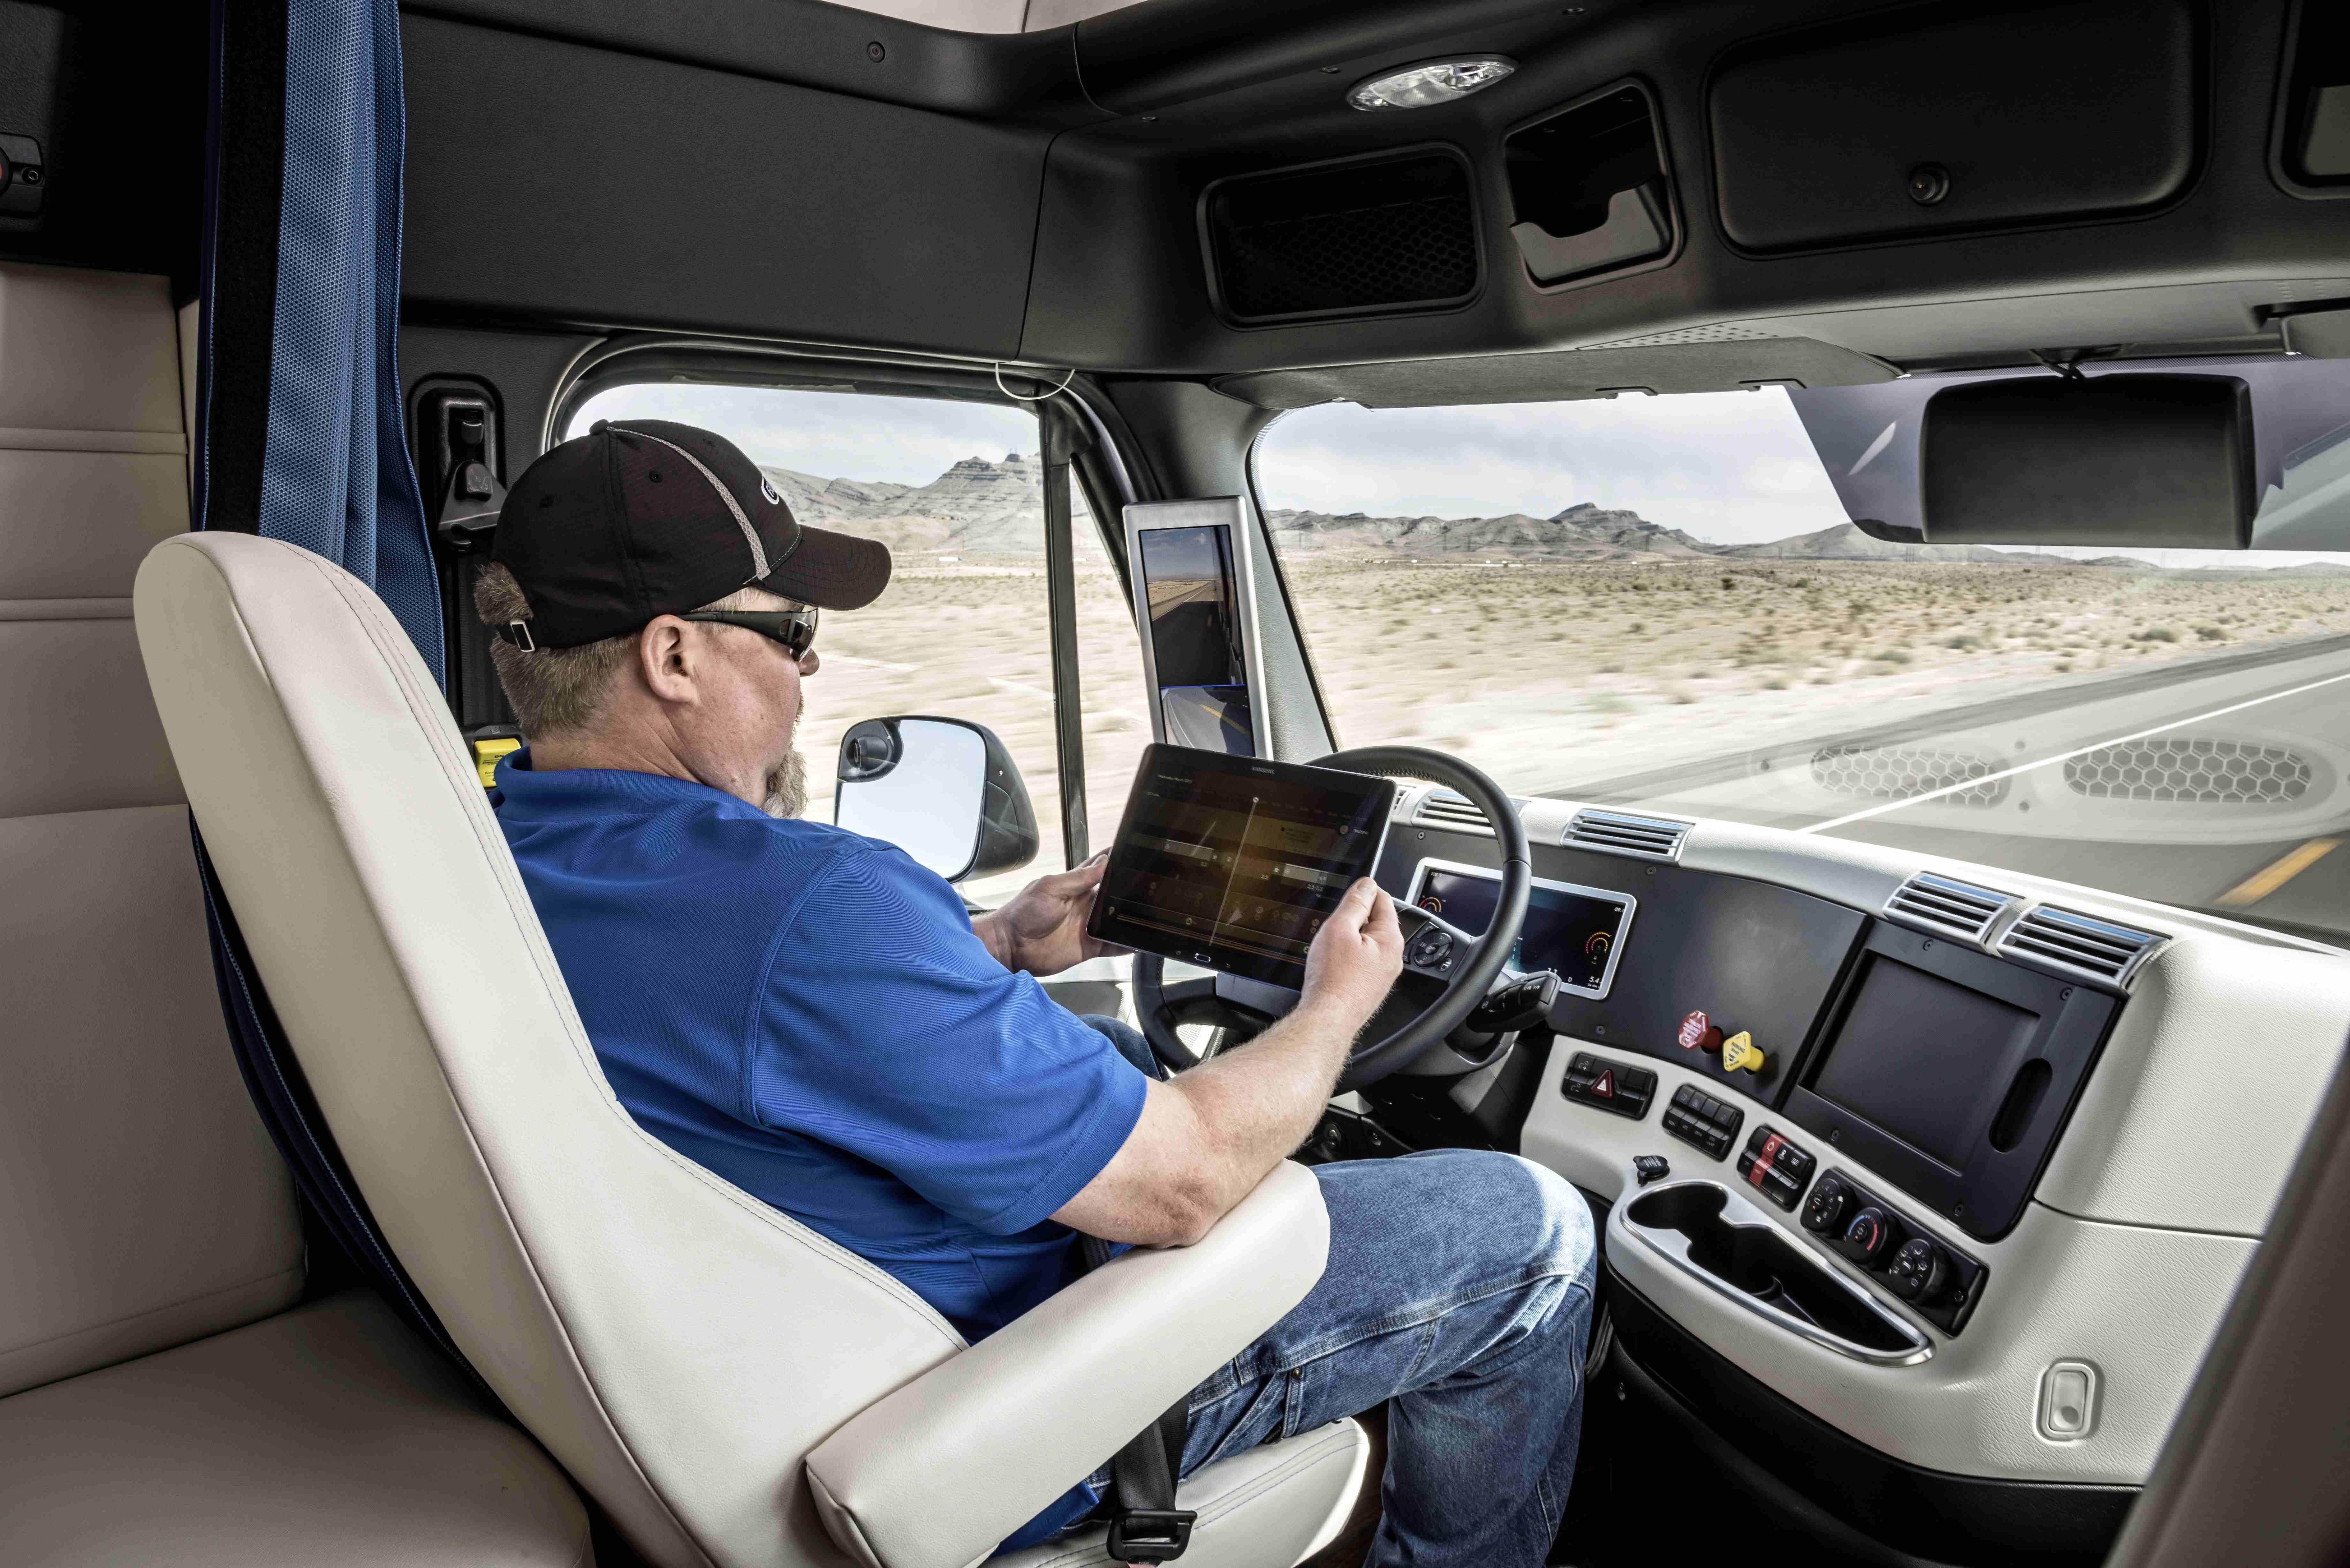 U.S. DOT initiates regulatory framework for autonomous trucks